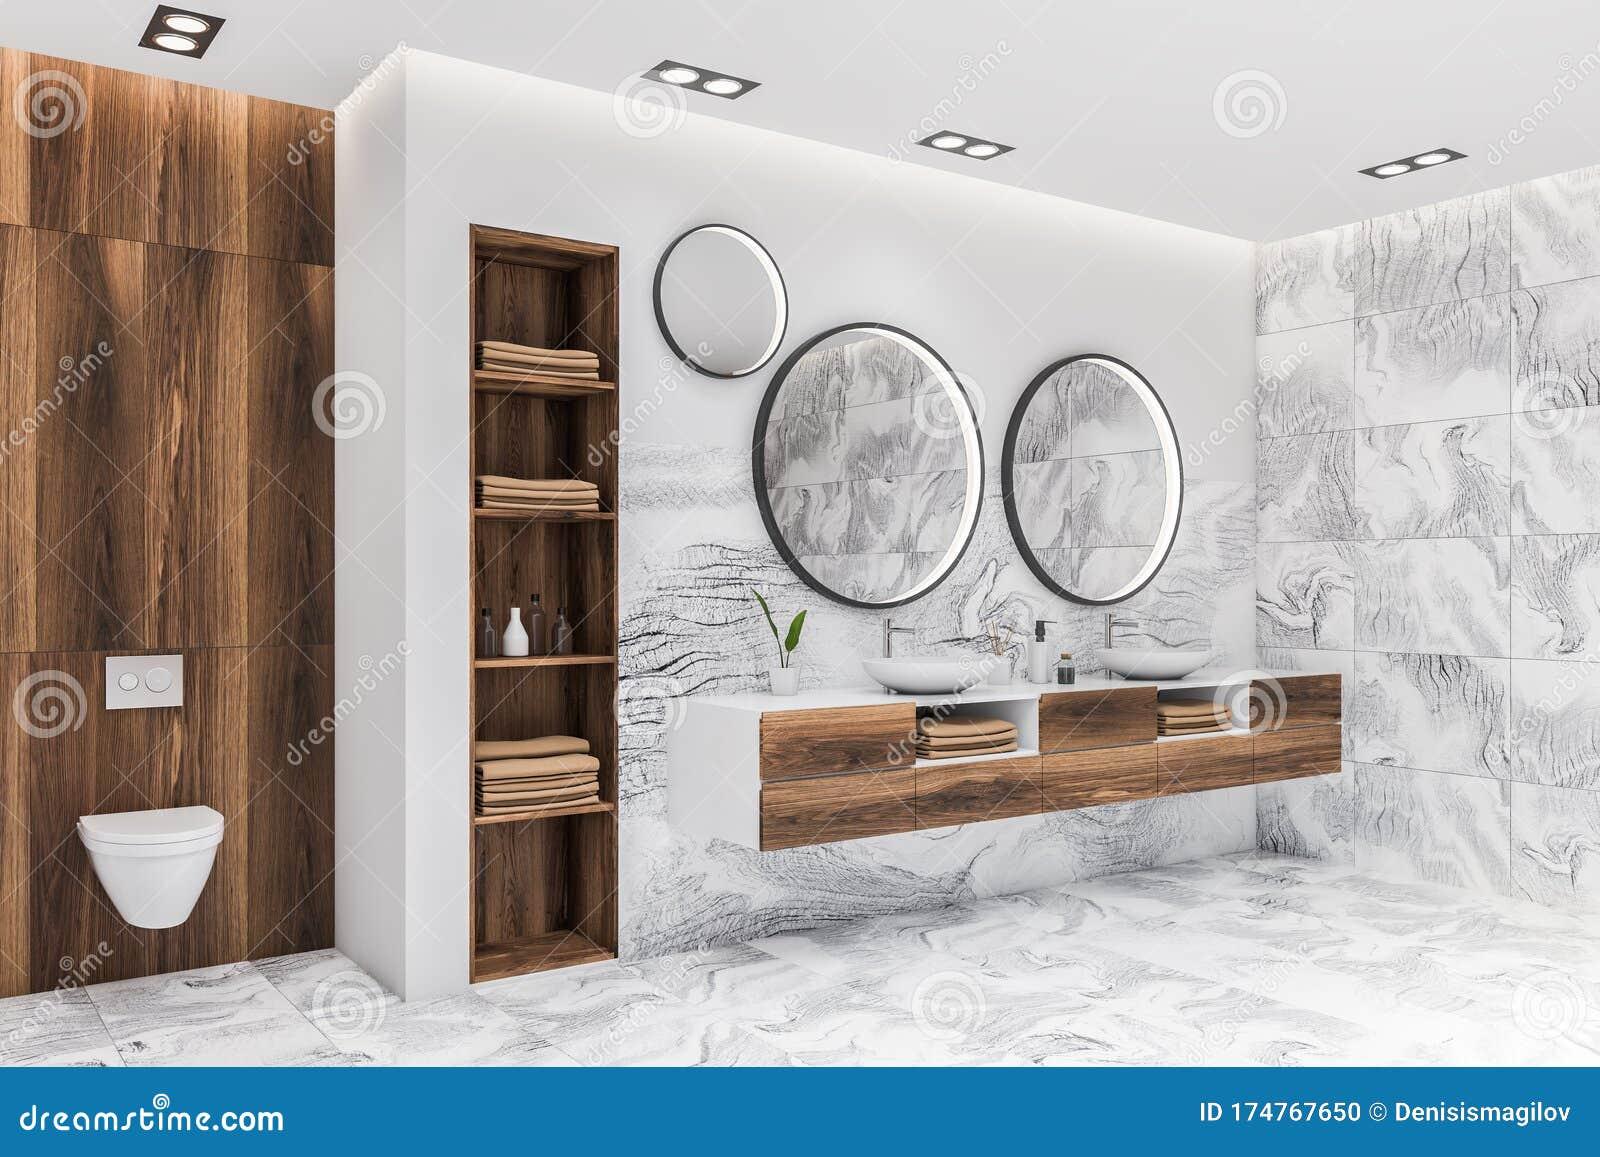 White Marble Bathroom Corner Sink And Toilet Stock Illustration Illustration Of Basin Elegance 174767650